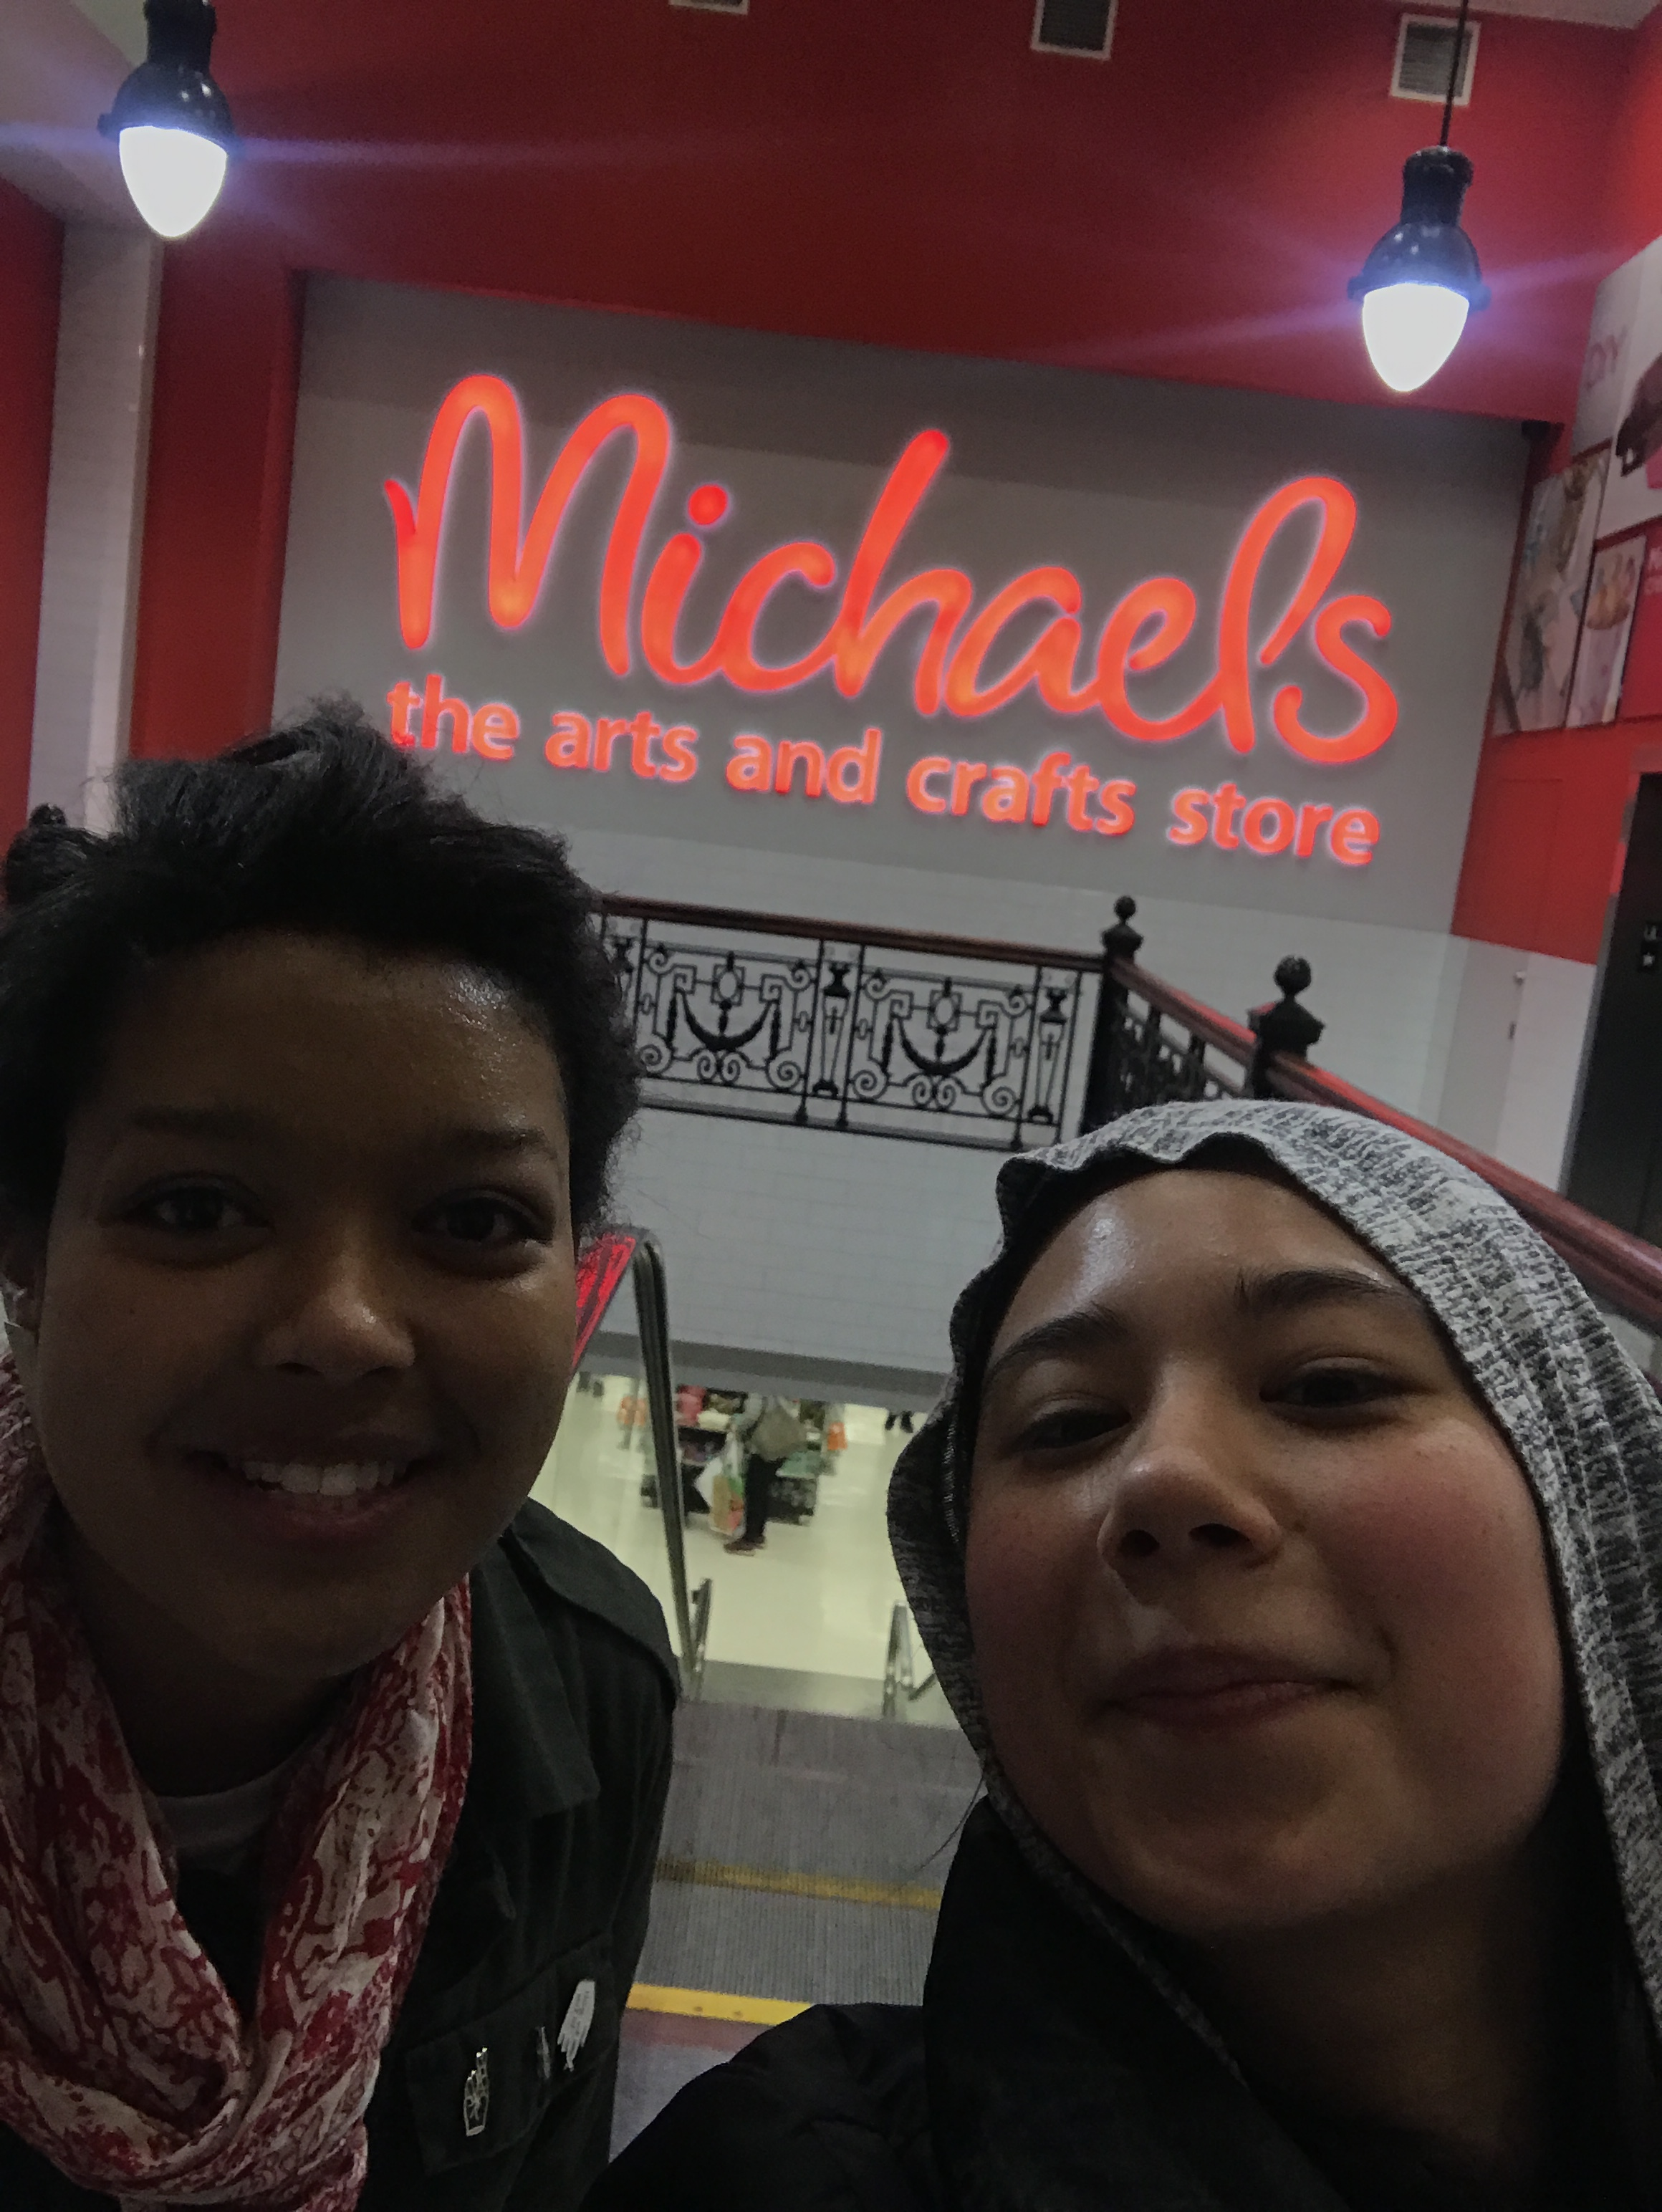 When it's a rainy day, visit Michael's!